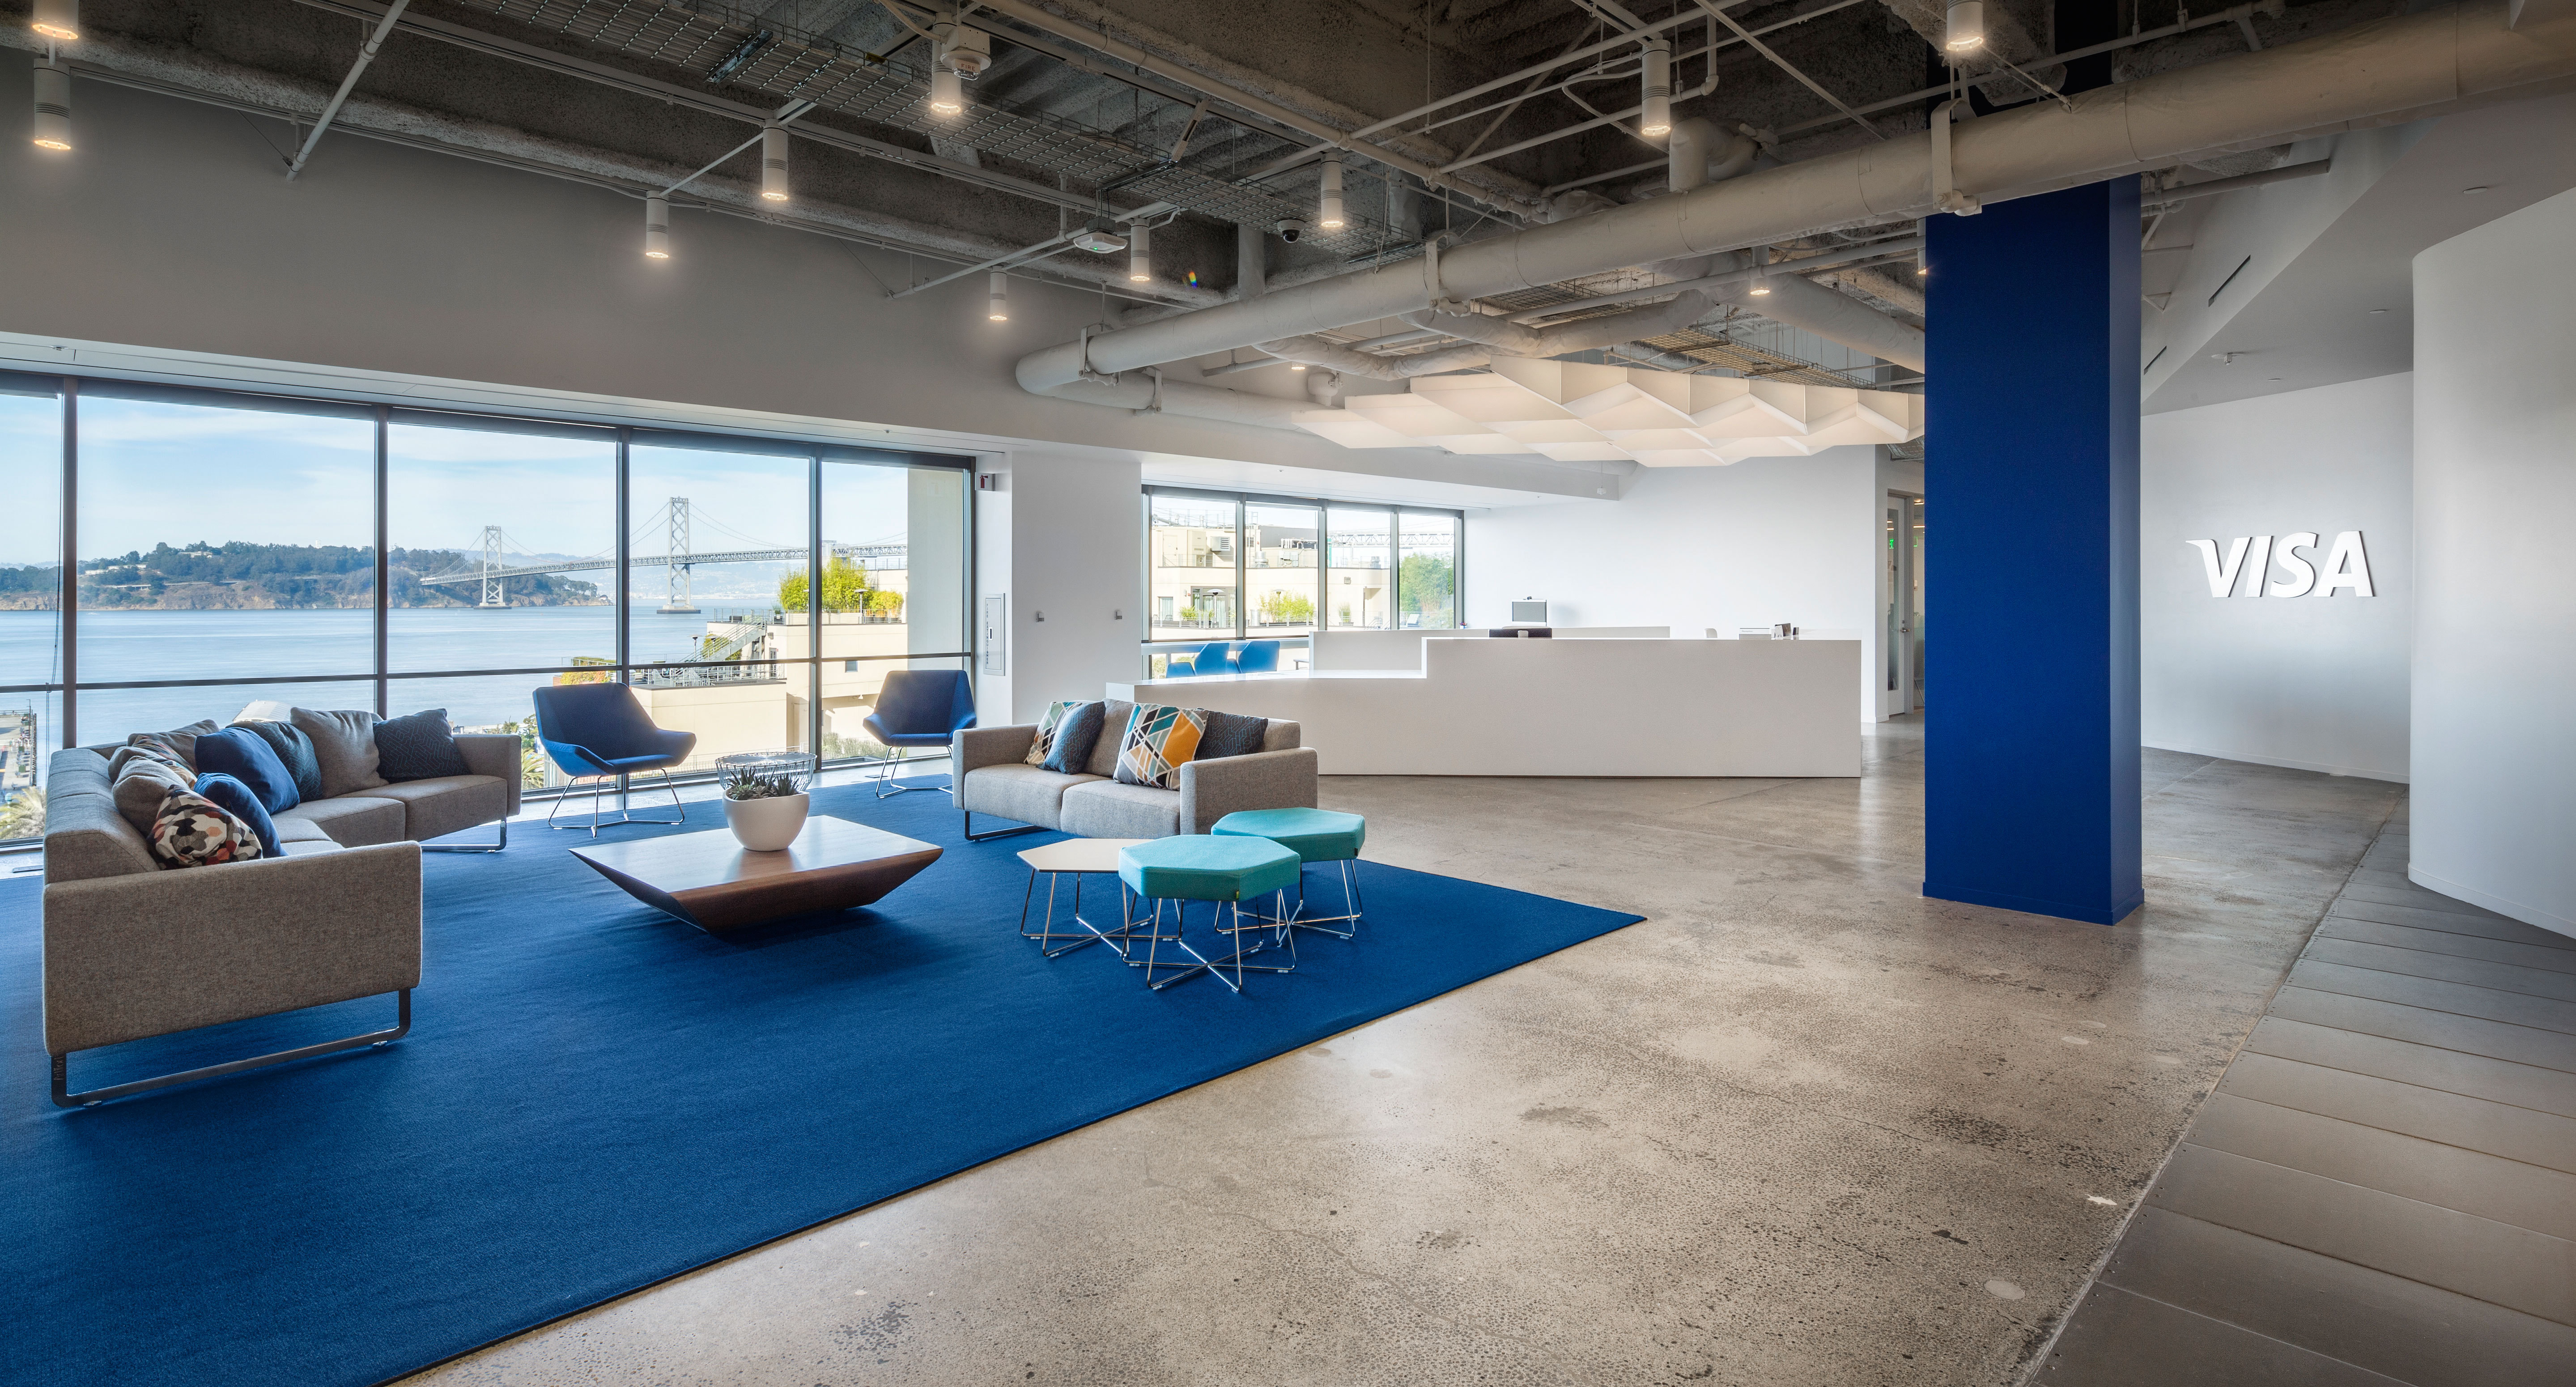 Officedesigns Visa Opens San Francisco Technology Center To Advance